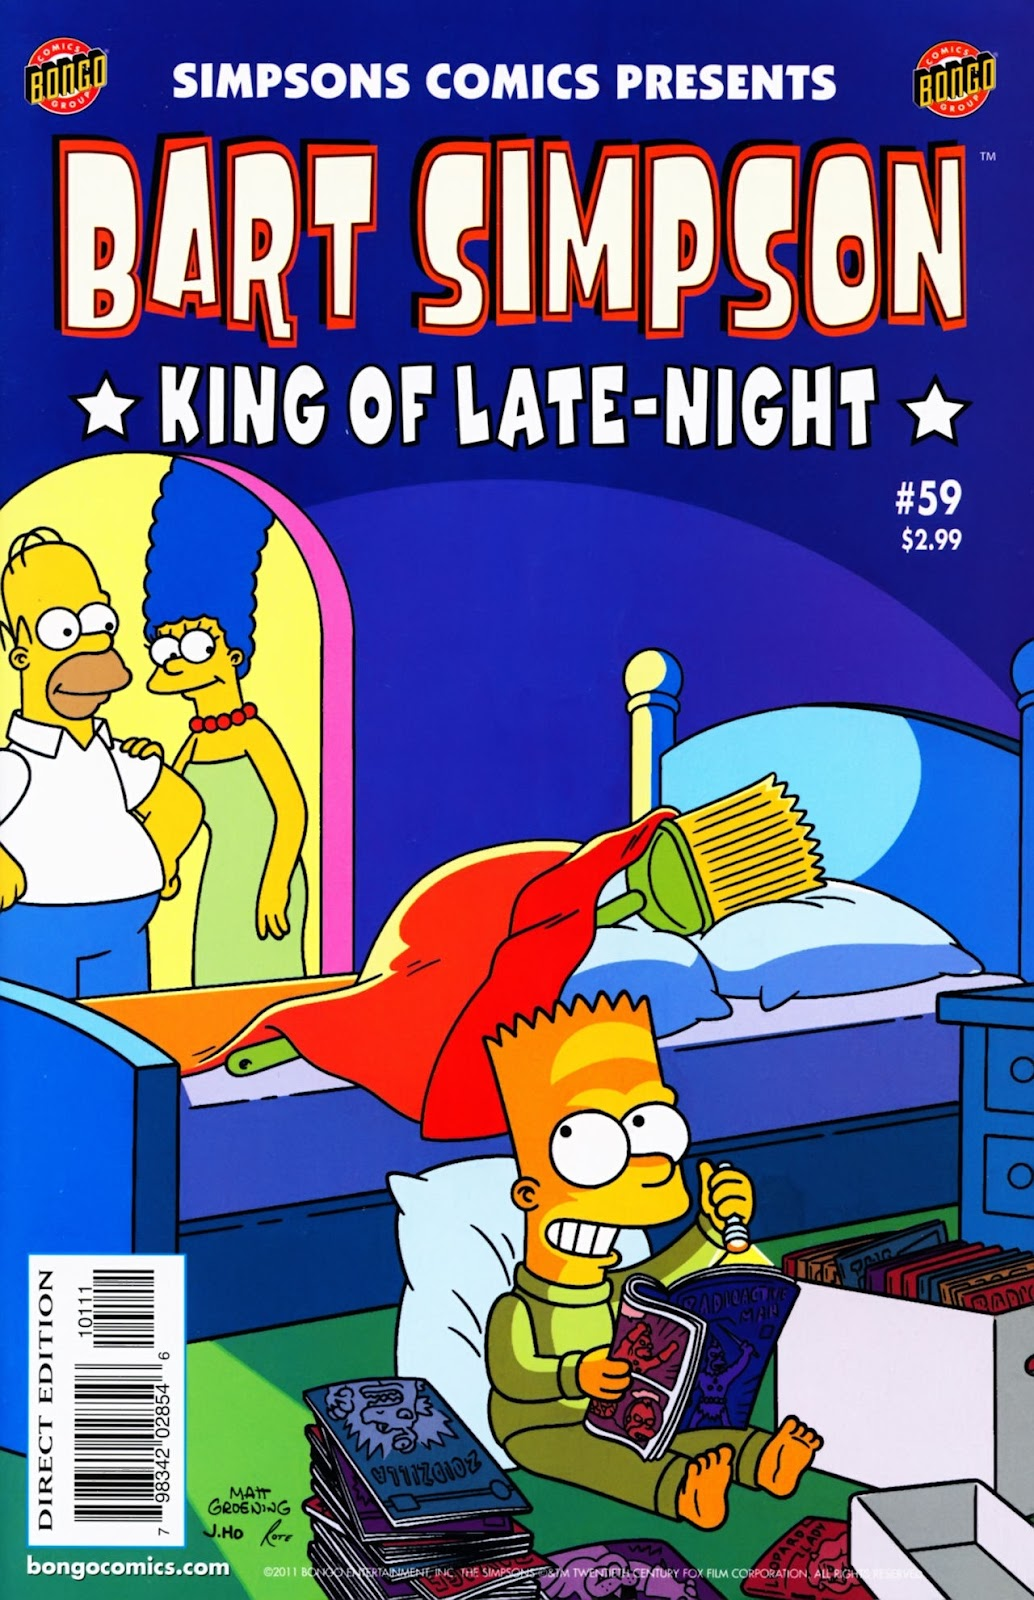 Simpsons Comics Presents Bart Simpson 59 Page 1